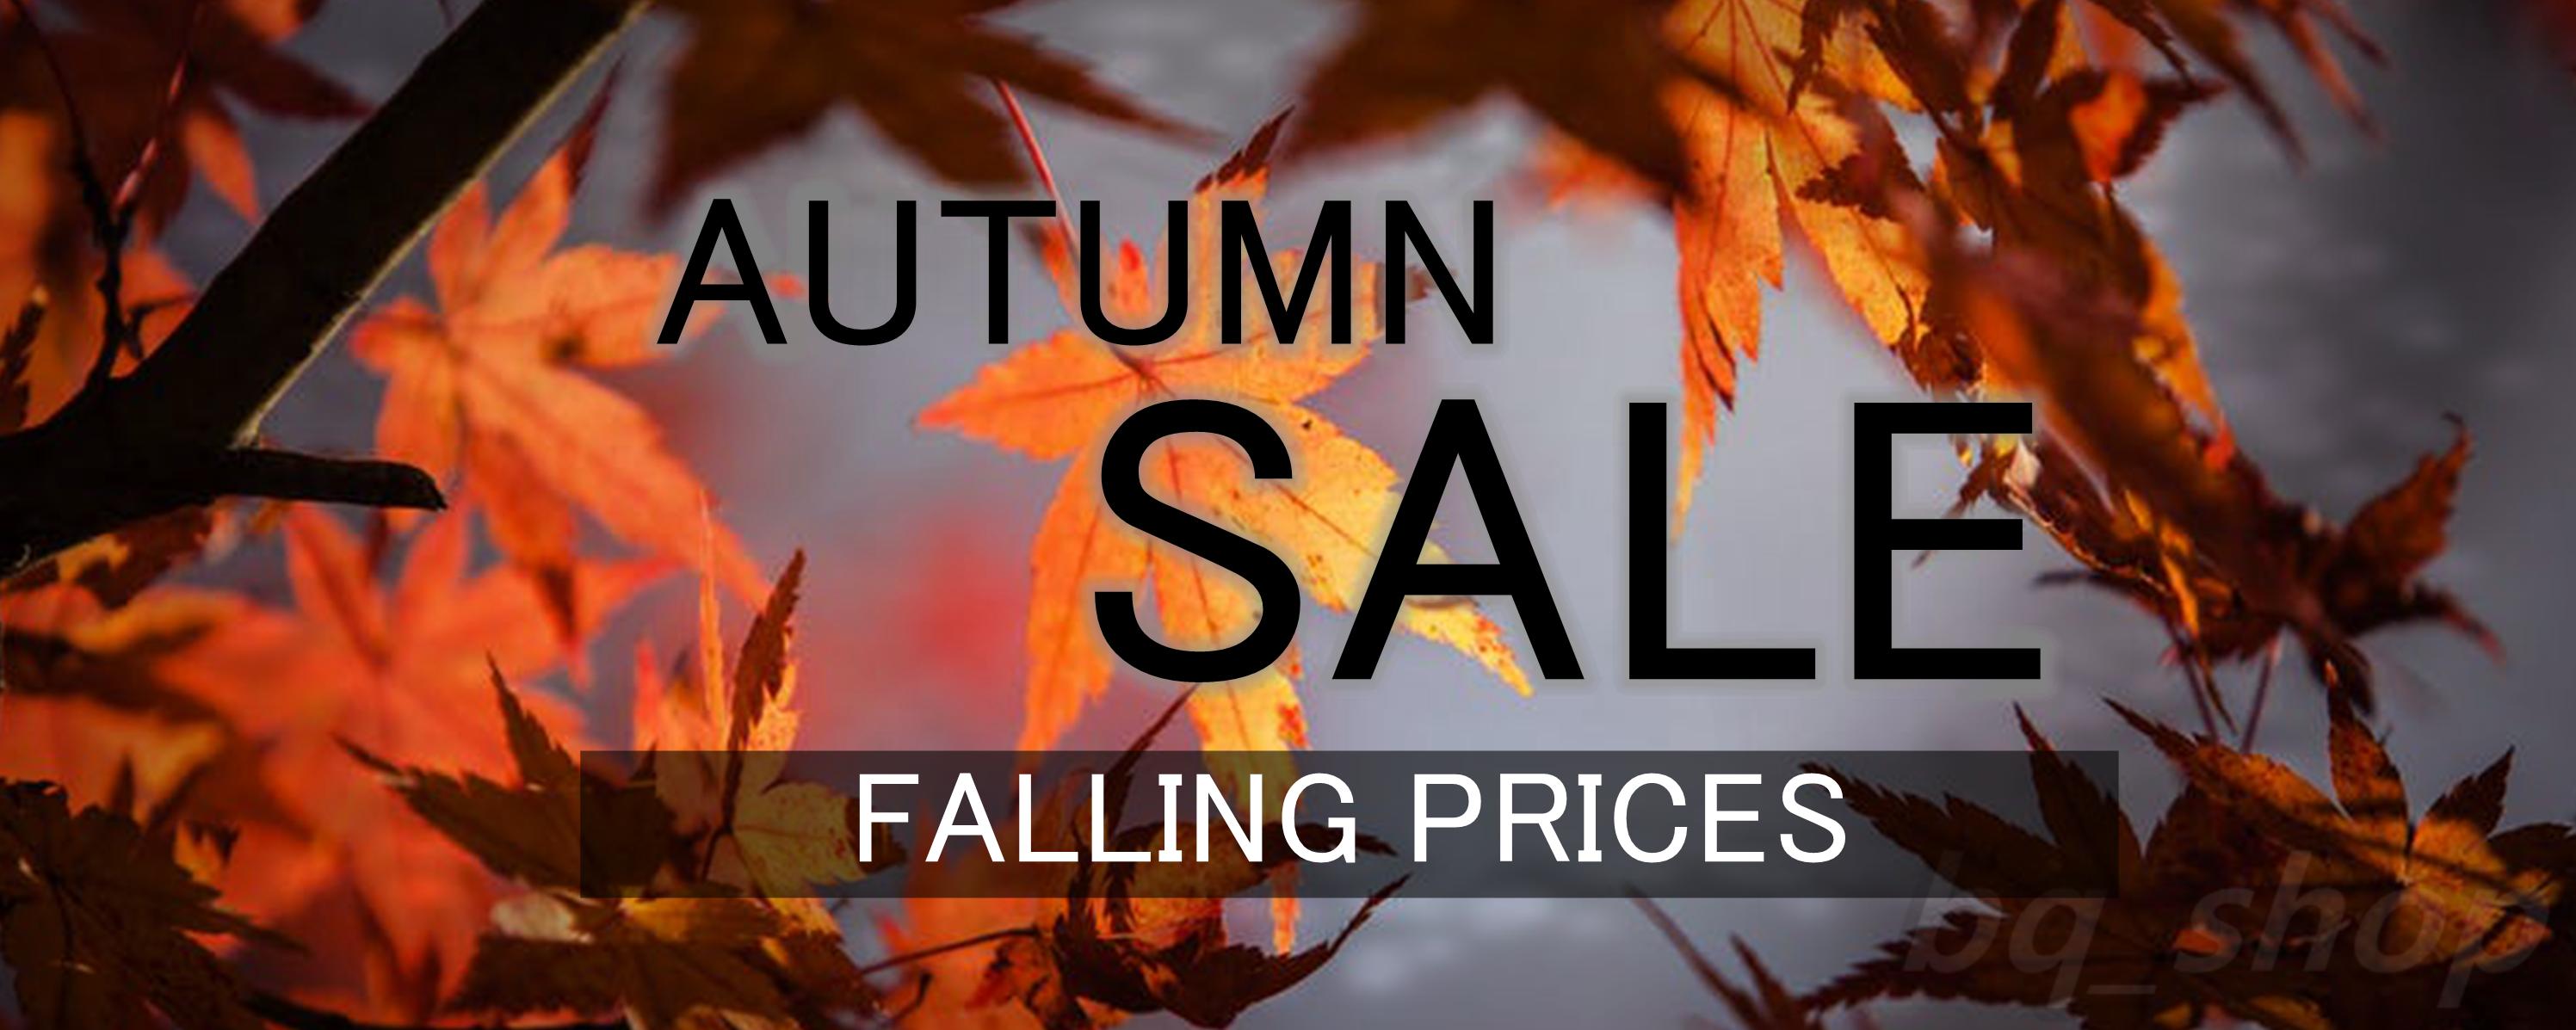 autumnsale1-bqshopestore.com.png